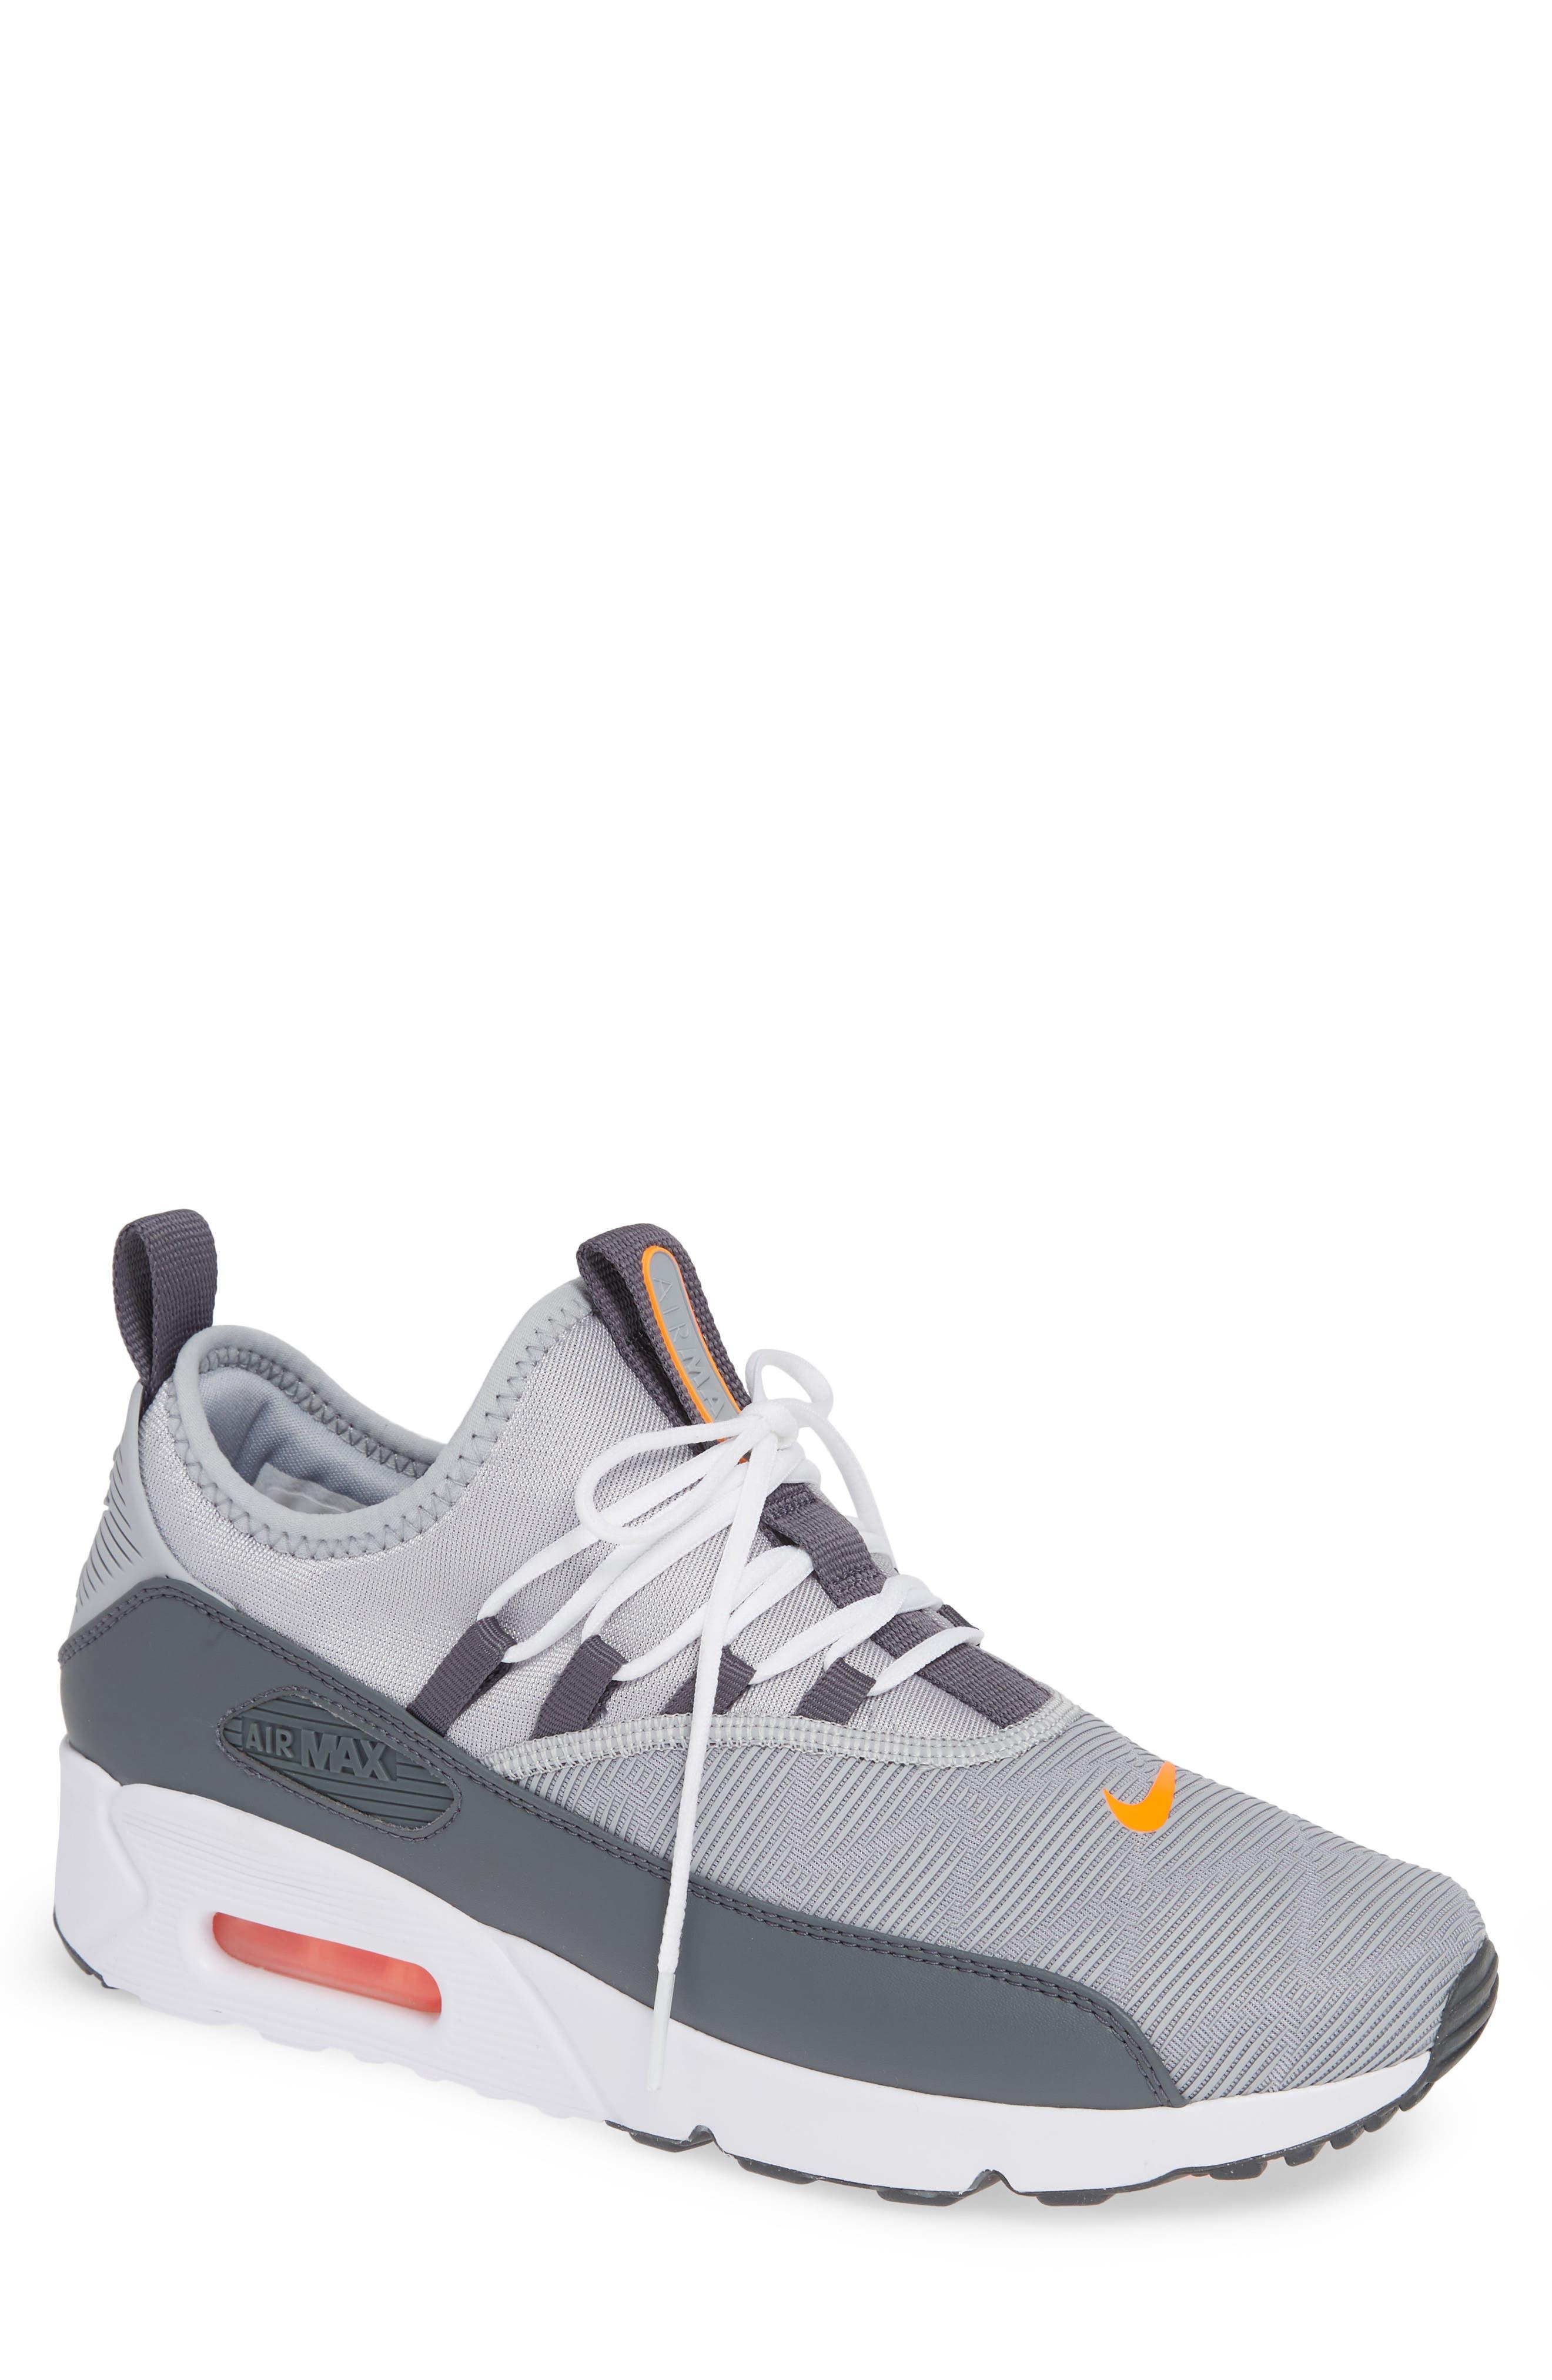 Air Max 90 EZ Sneaker,                             Main thumbnail 1, color,                             021